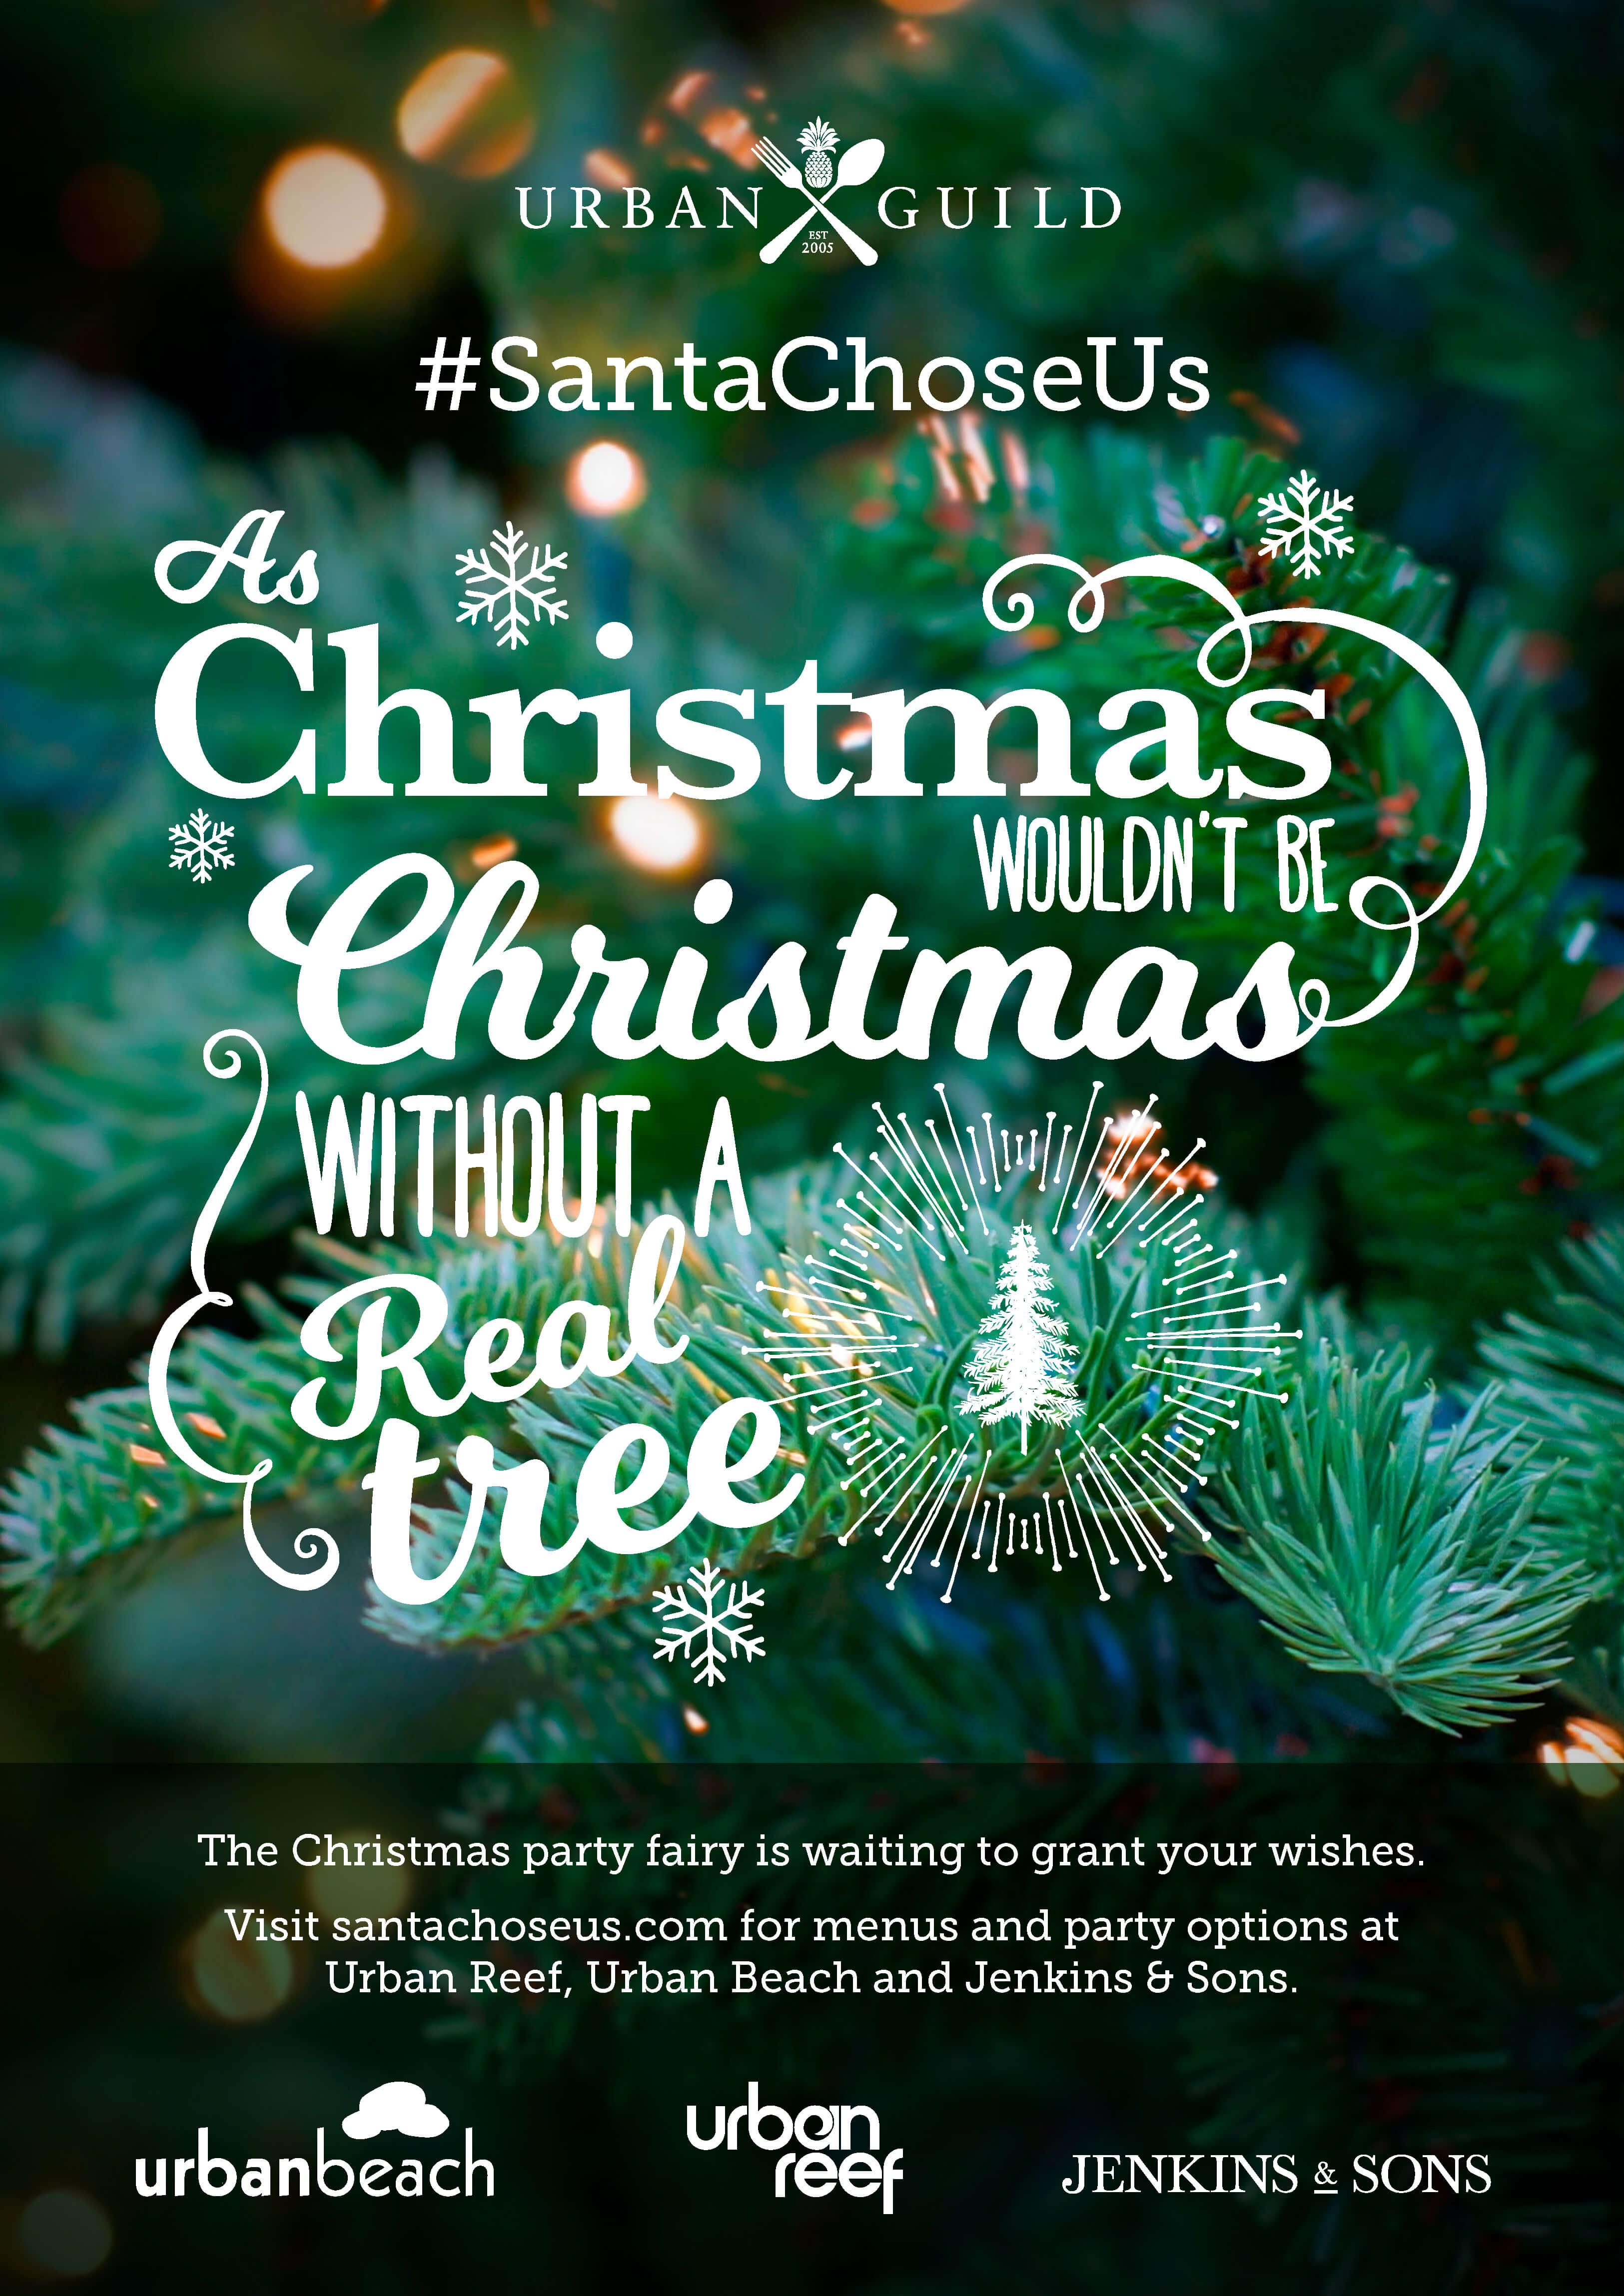 Santa Chose Us Campaign